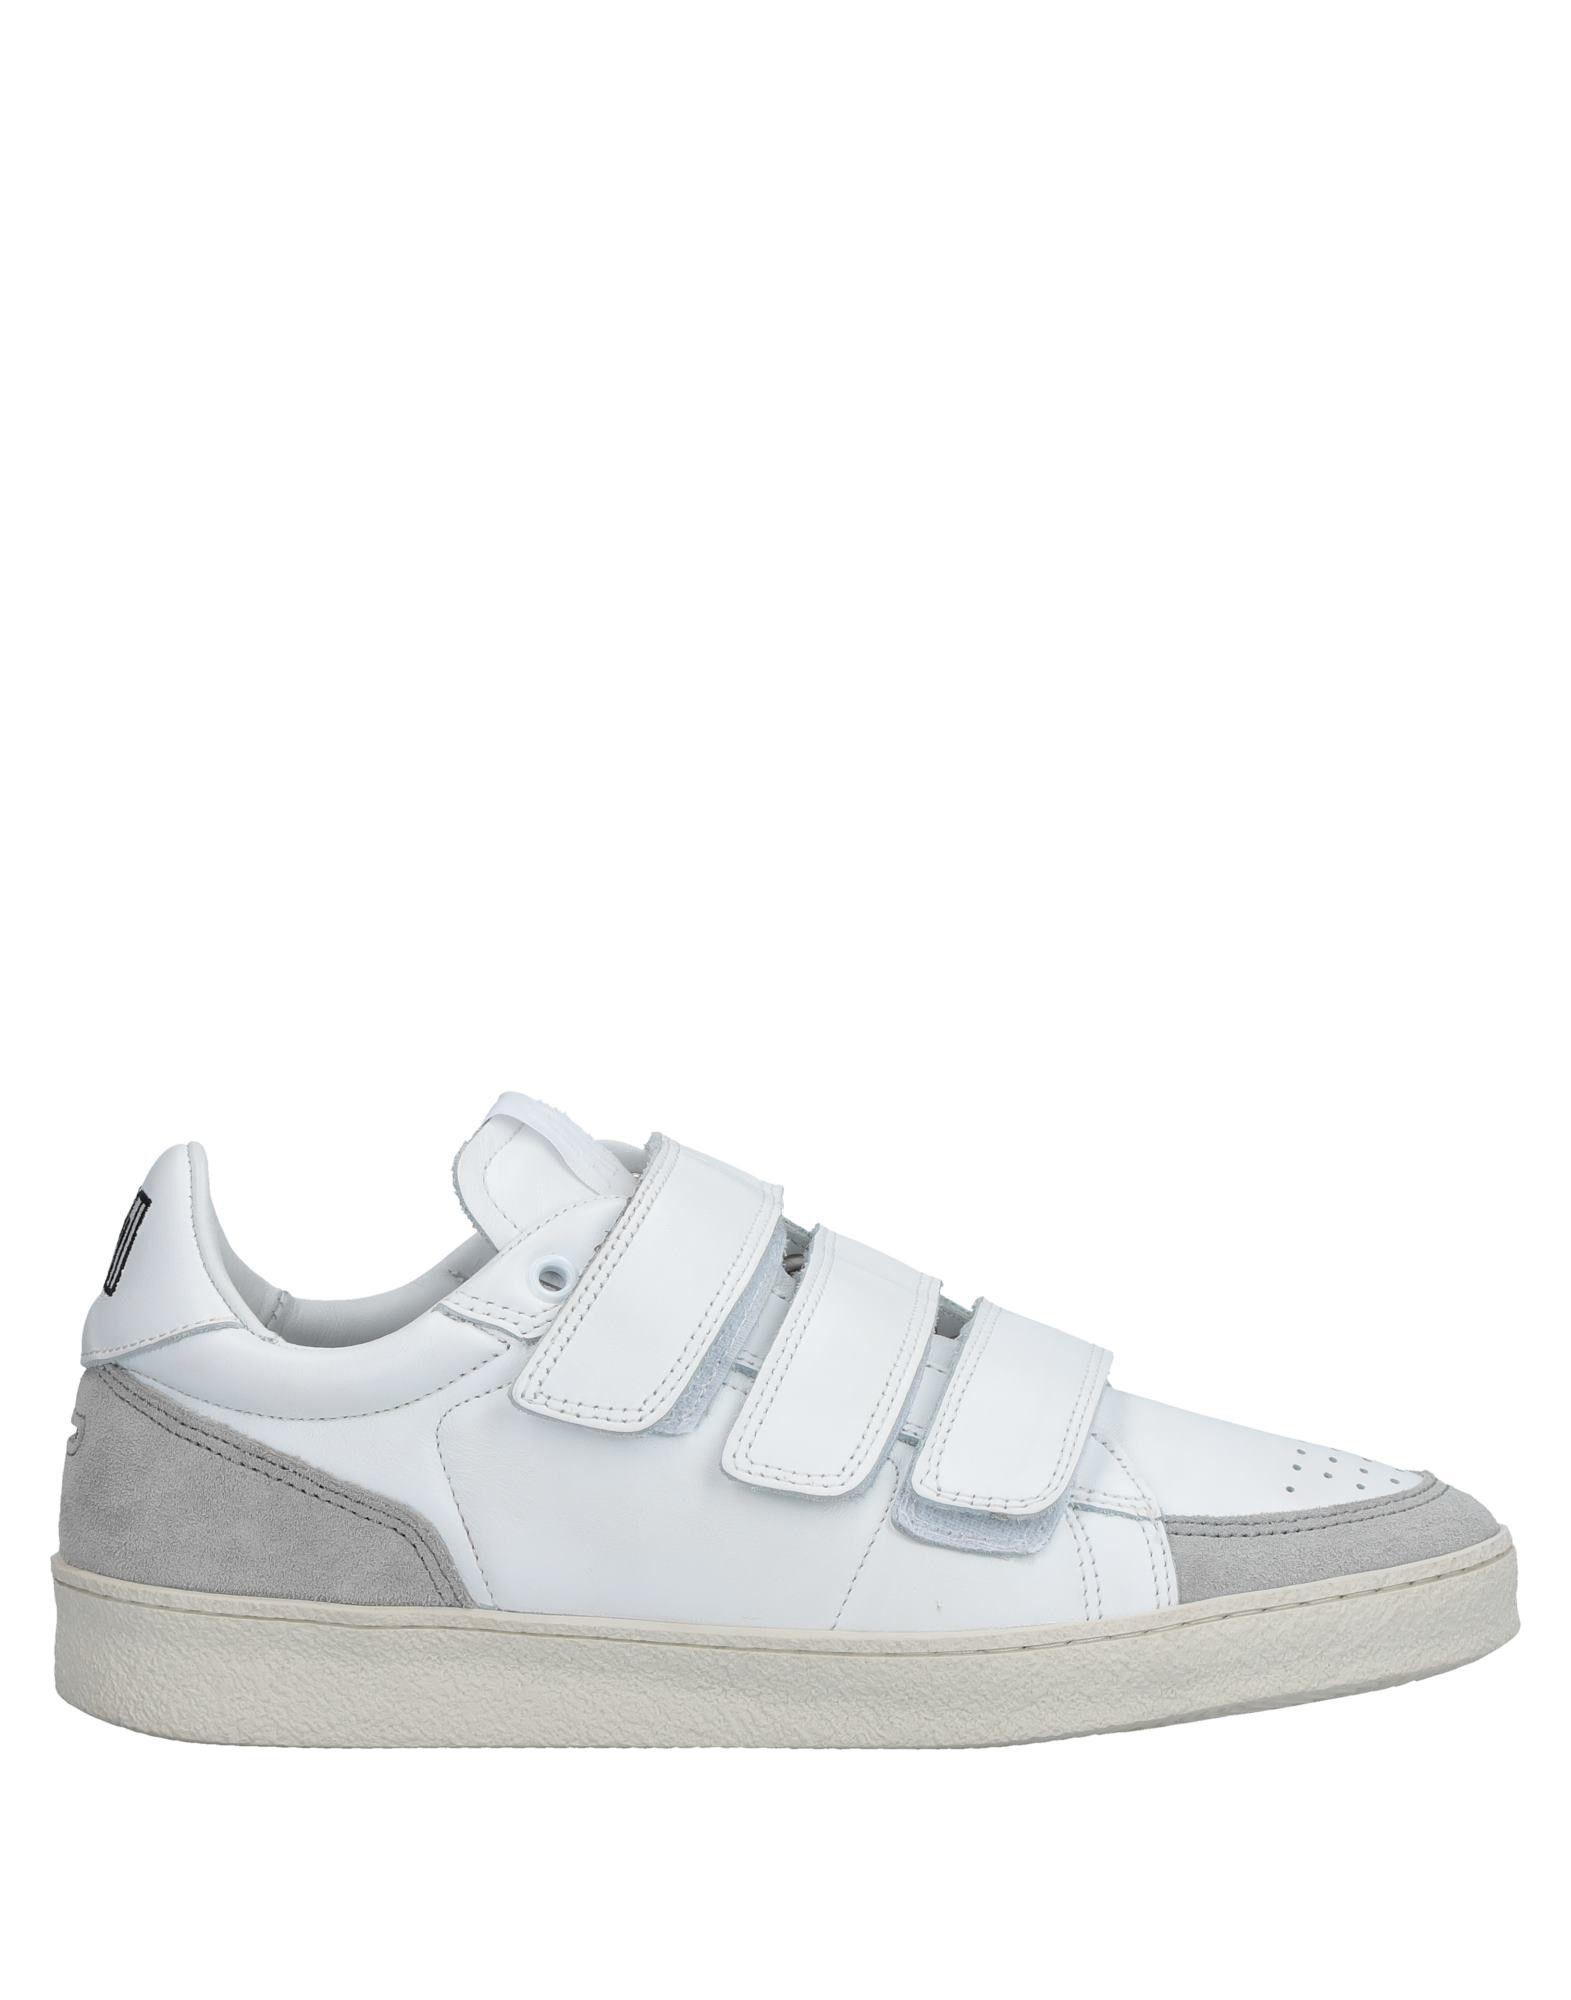 Sneakers Alexandre Ami Alexandre Sneakers Mattiussi Uomo - 11528159VA a87d83